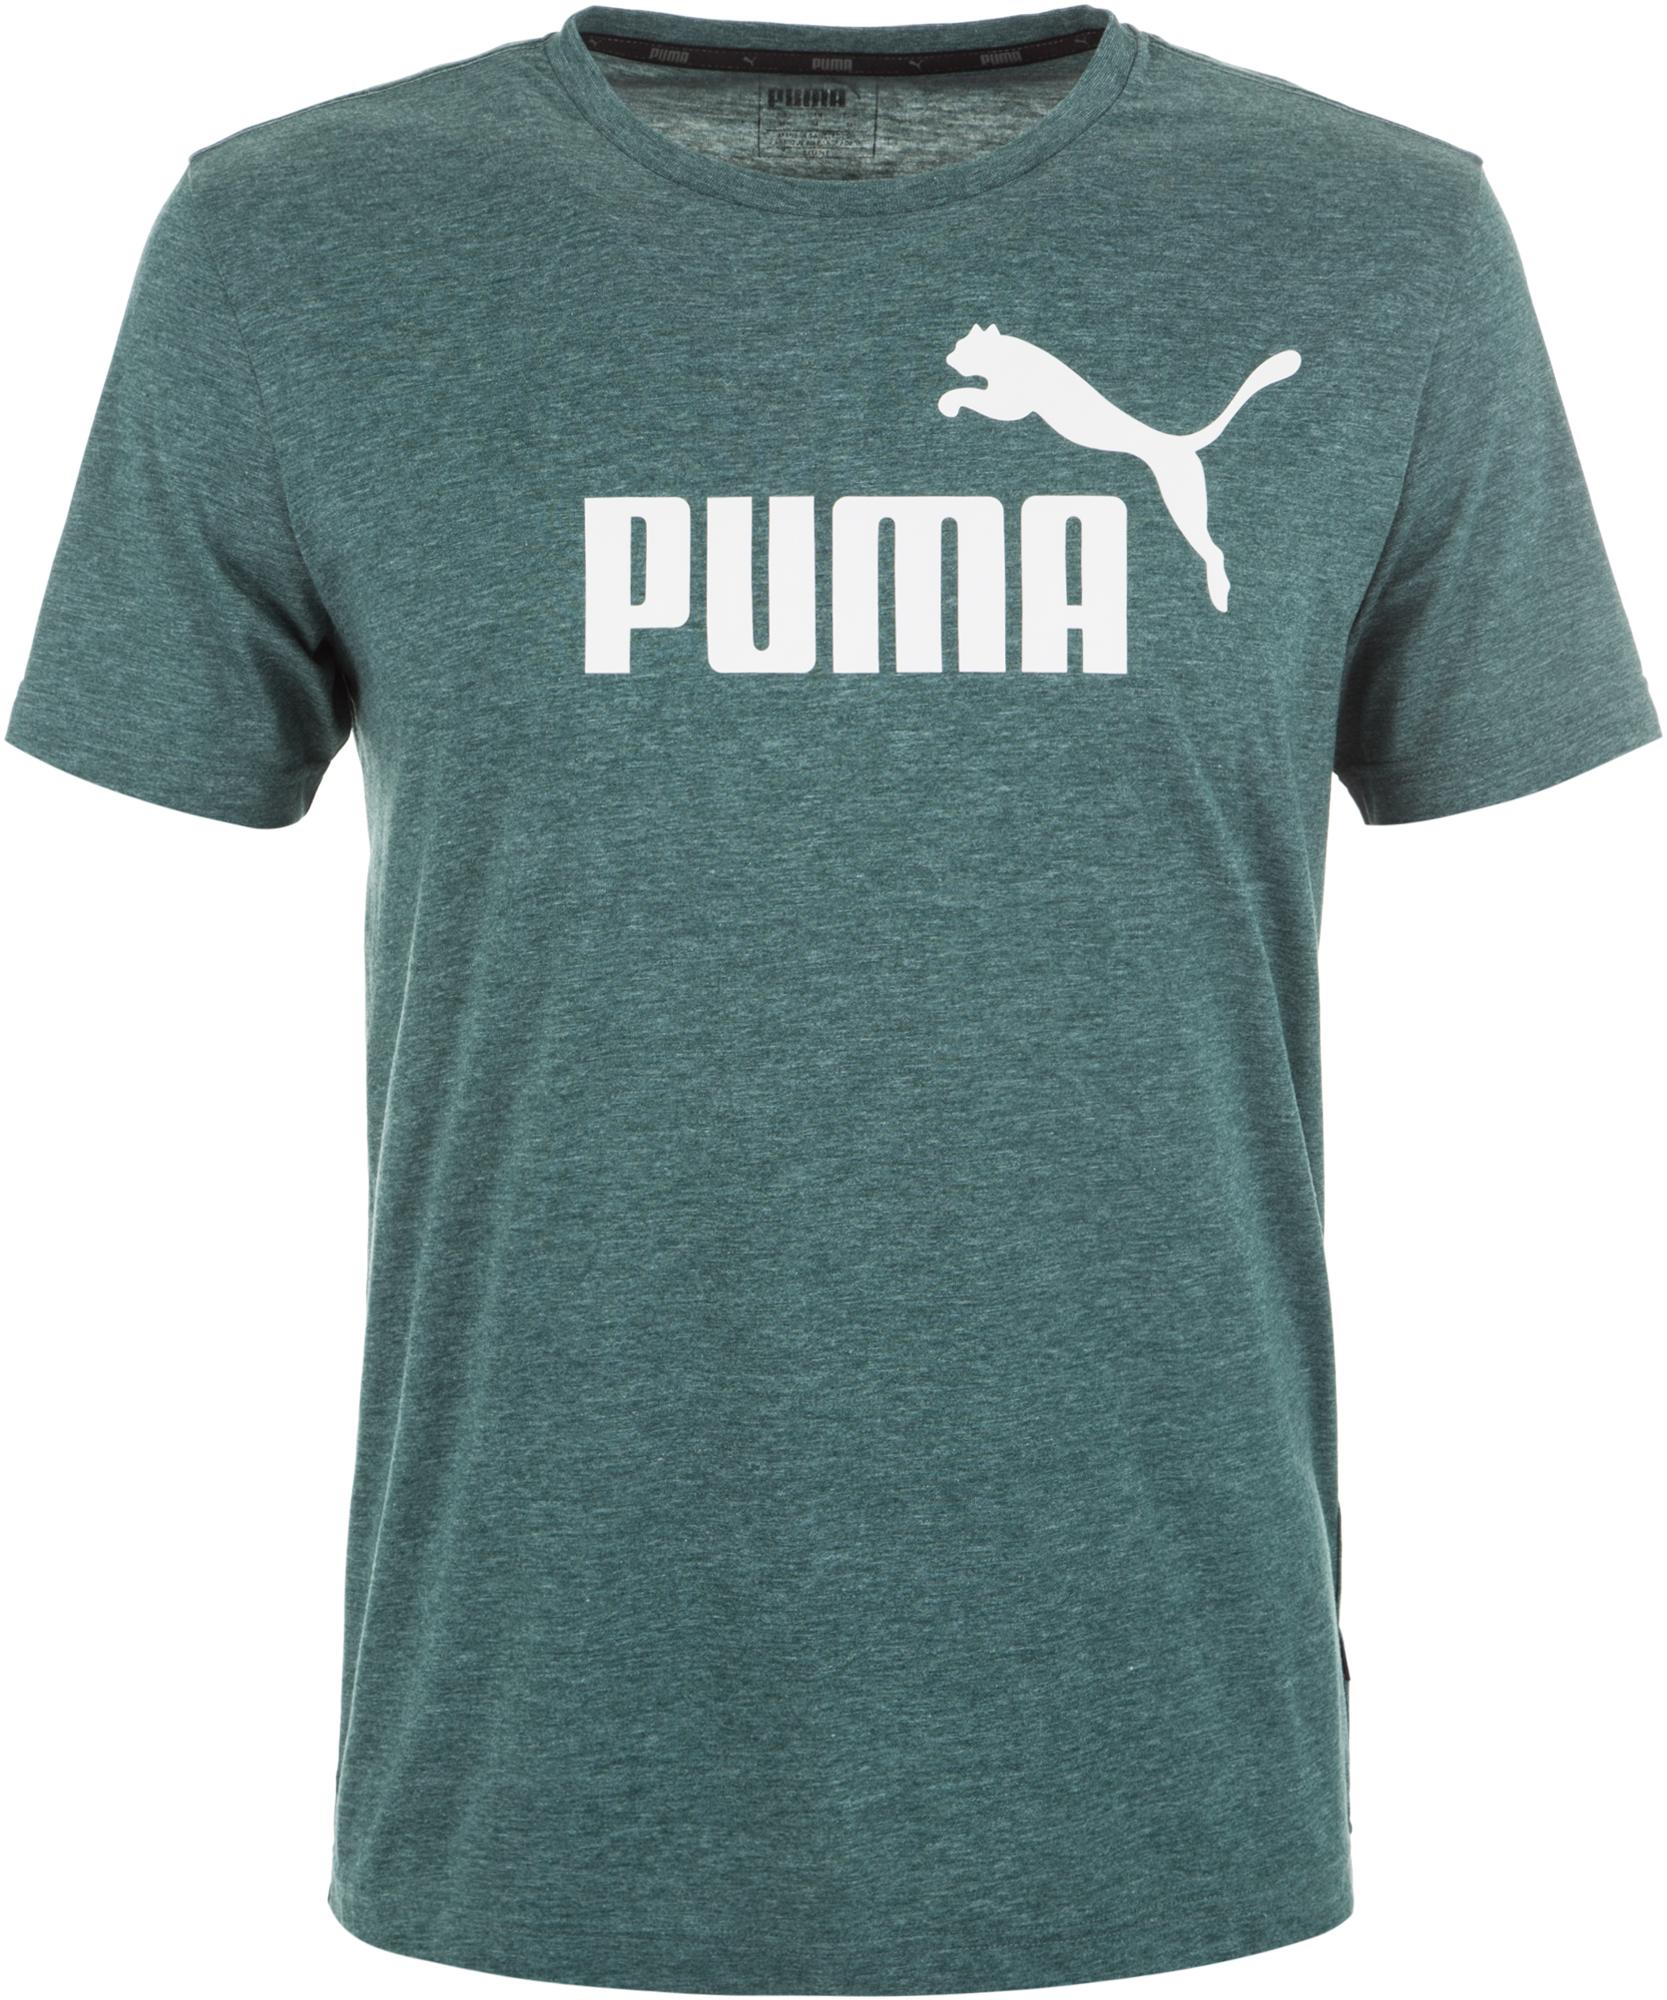 Puma Футболка мужская Puma ESS+ Heather Tee, размер 52-54